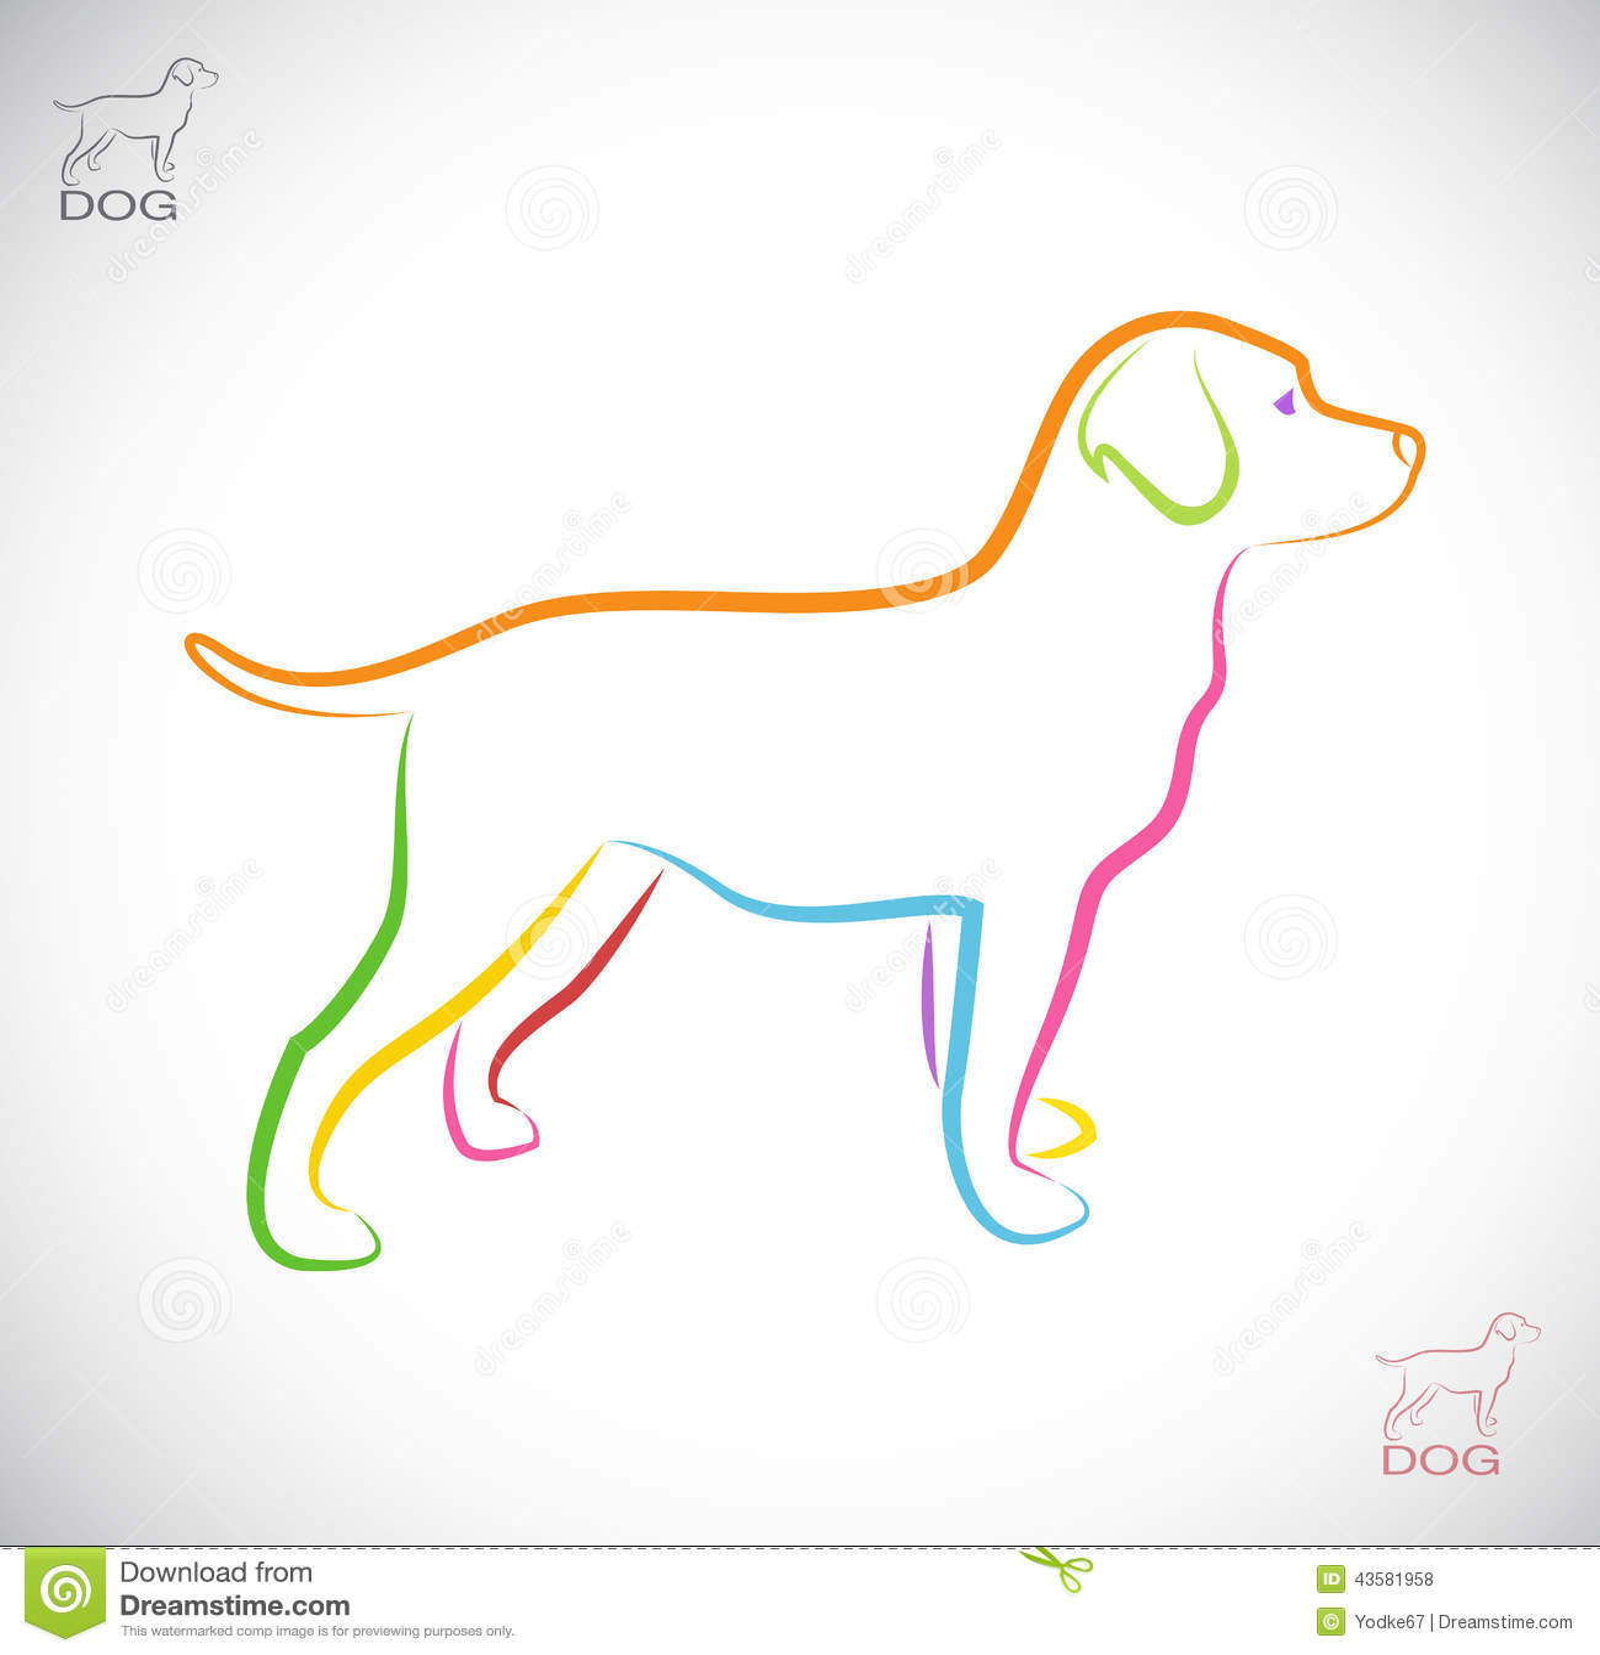 Dog Cartoon Video Download